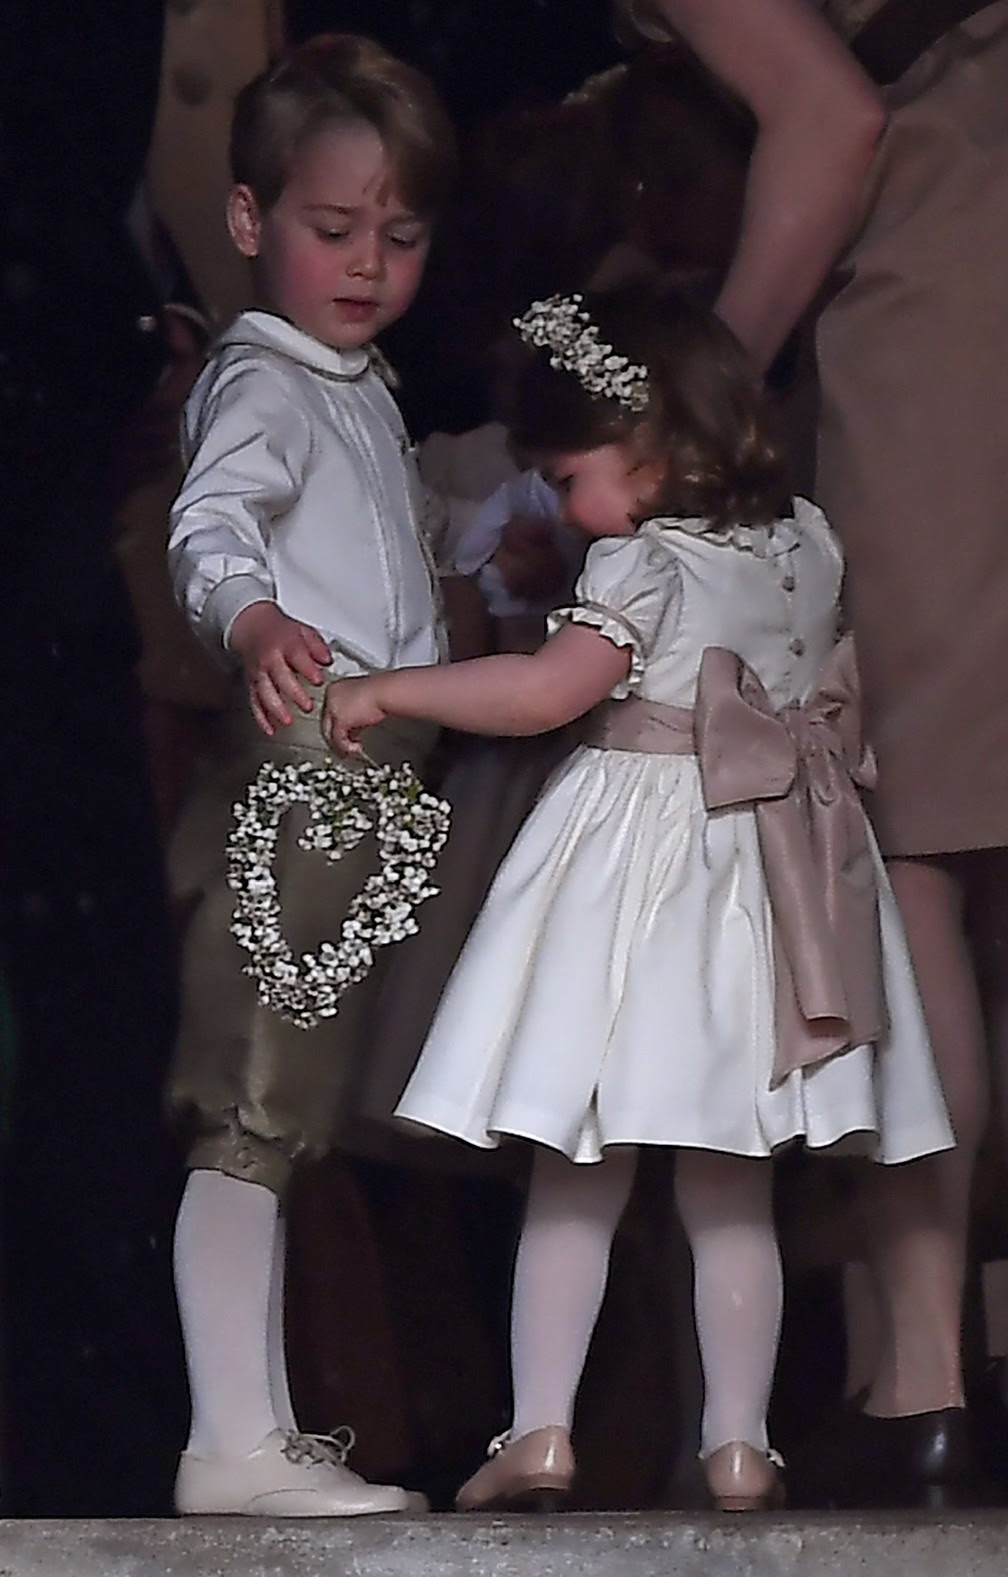 George foi pajem no casamento (Foto: Kirsty Wigglesworth/Reuters)